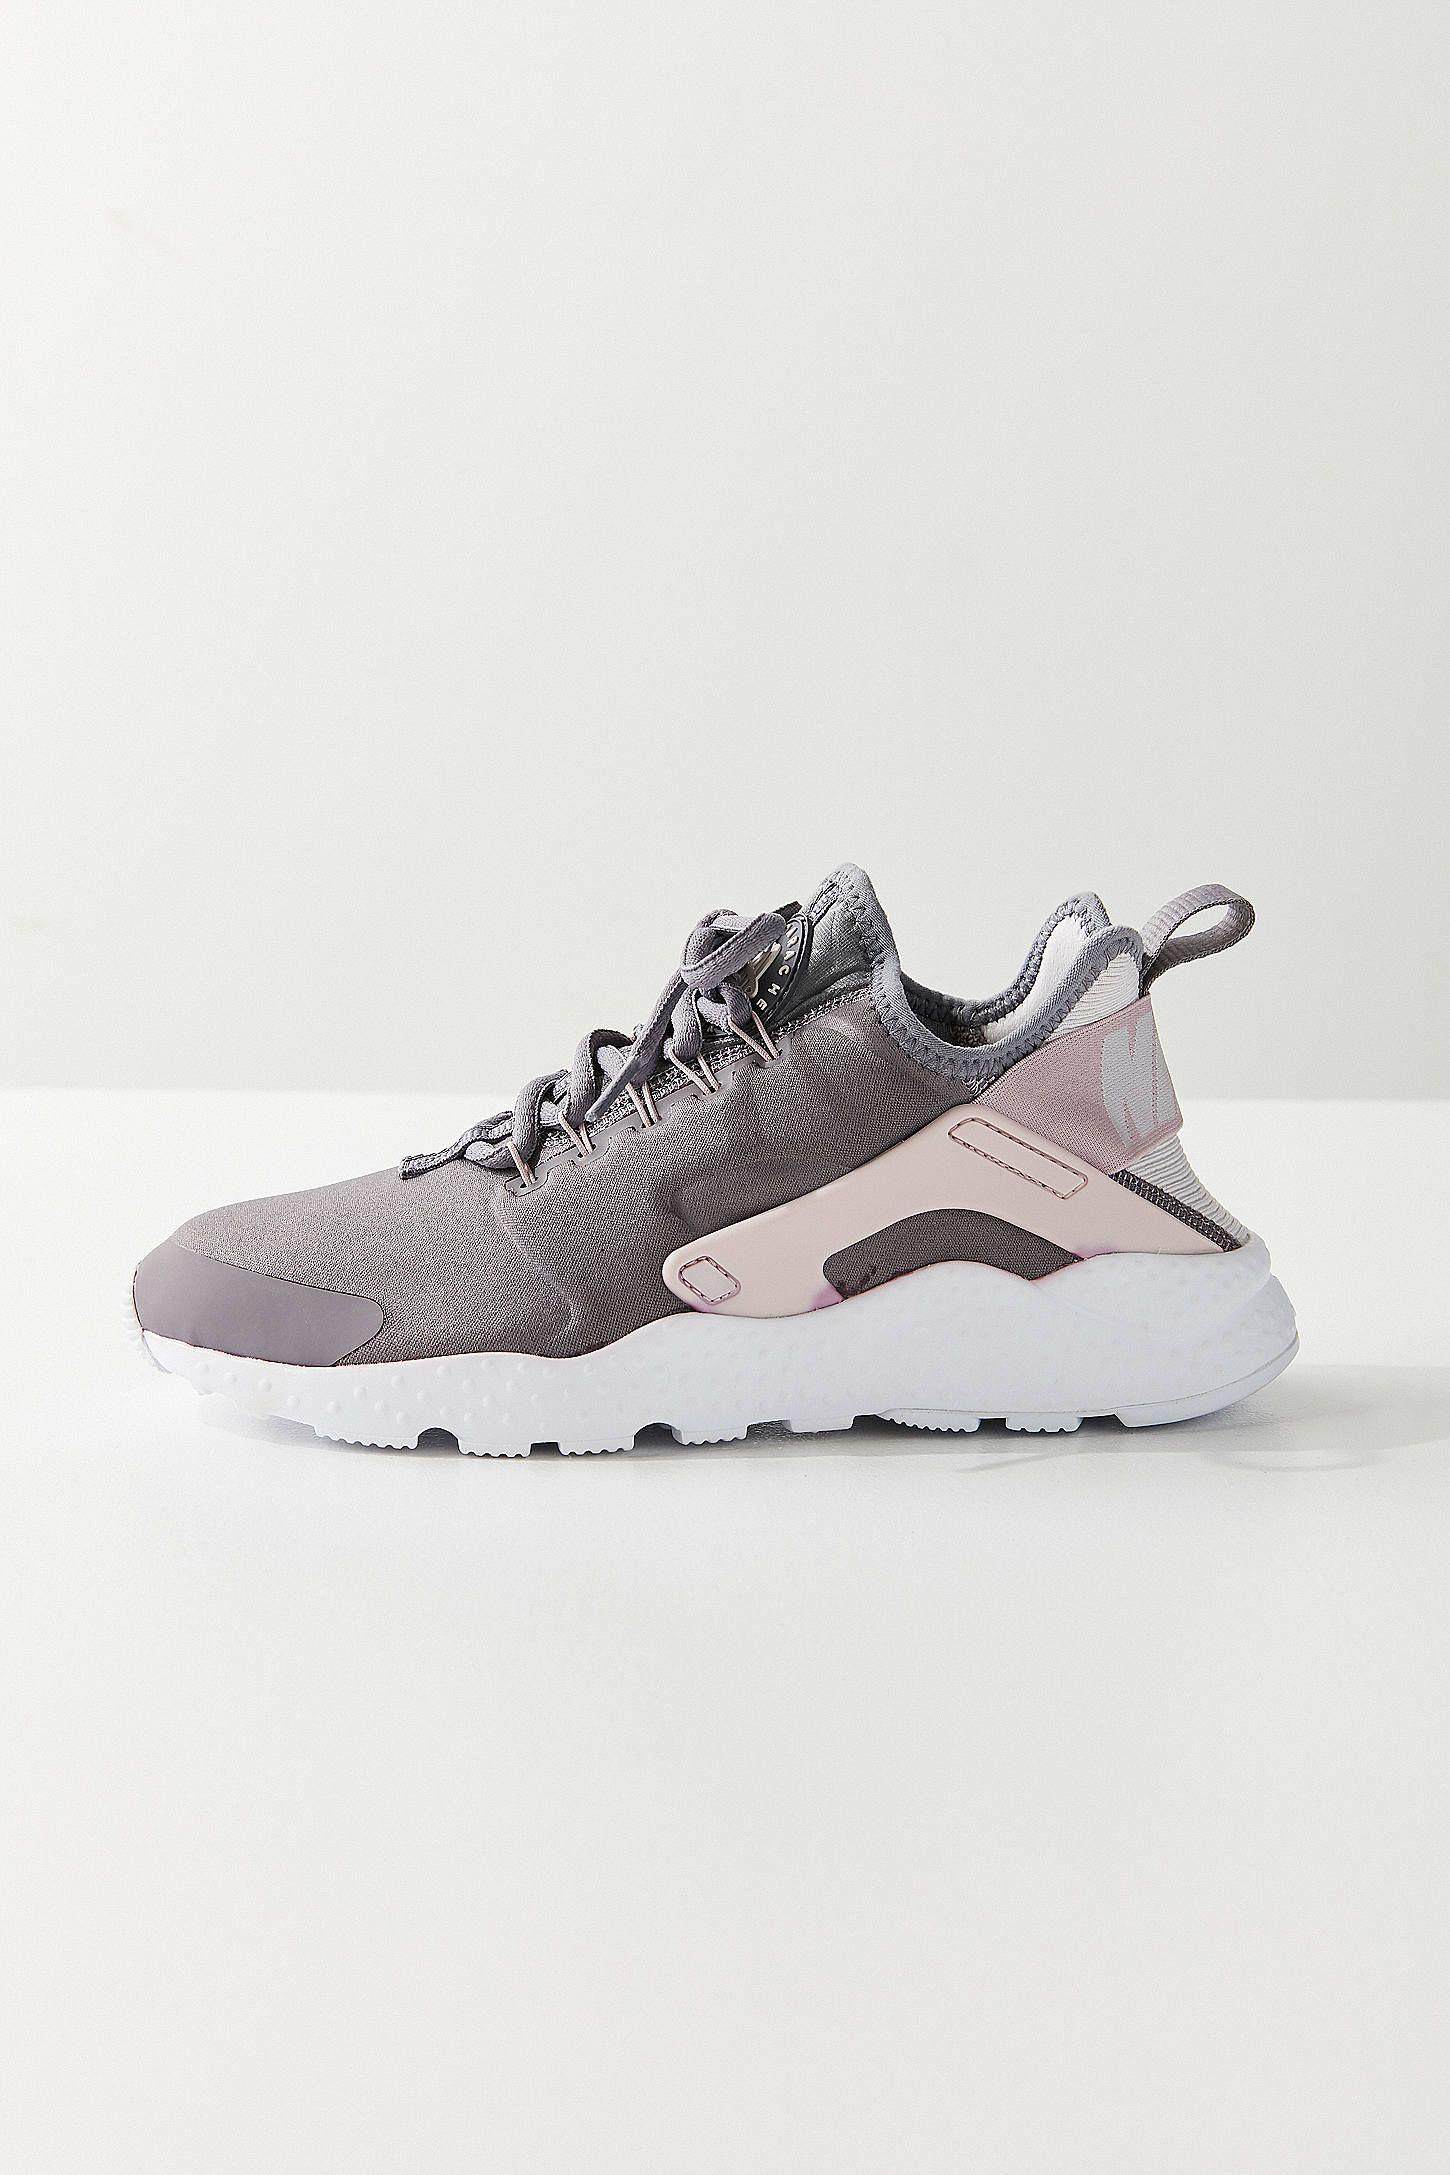 new arrival 89ae9 d469c Nike Air Huarache Ultra Sneaker   Urban Outfitters